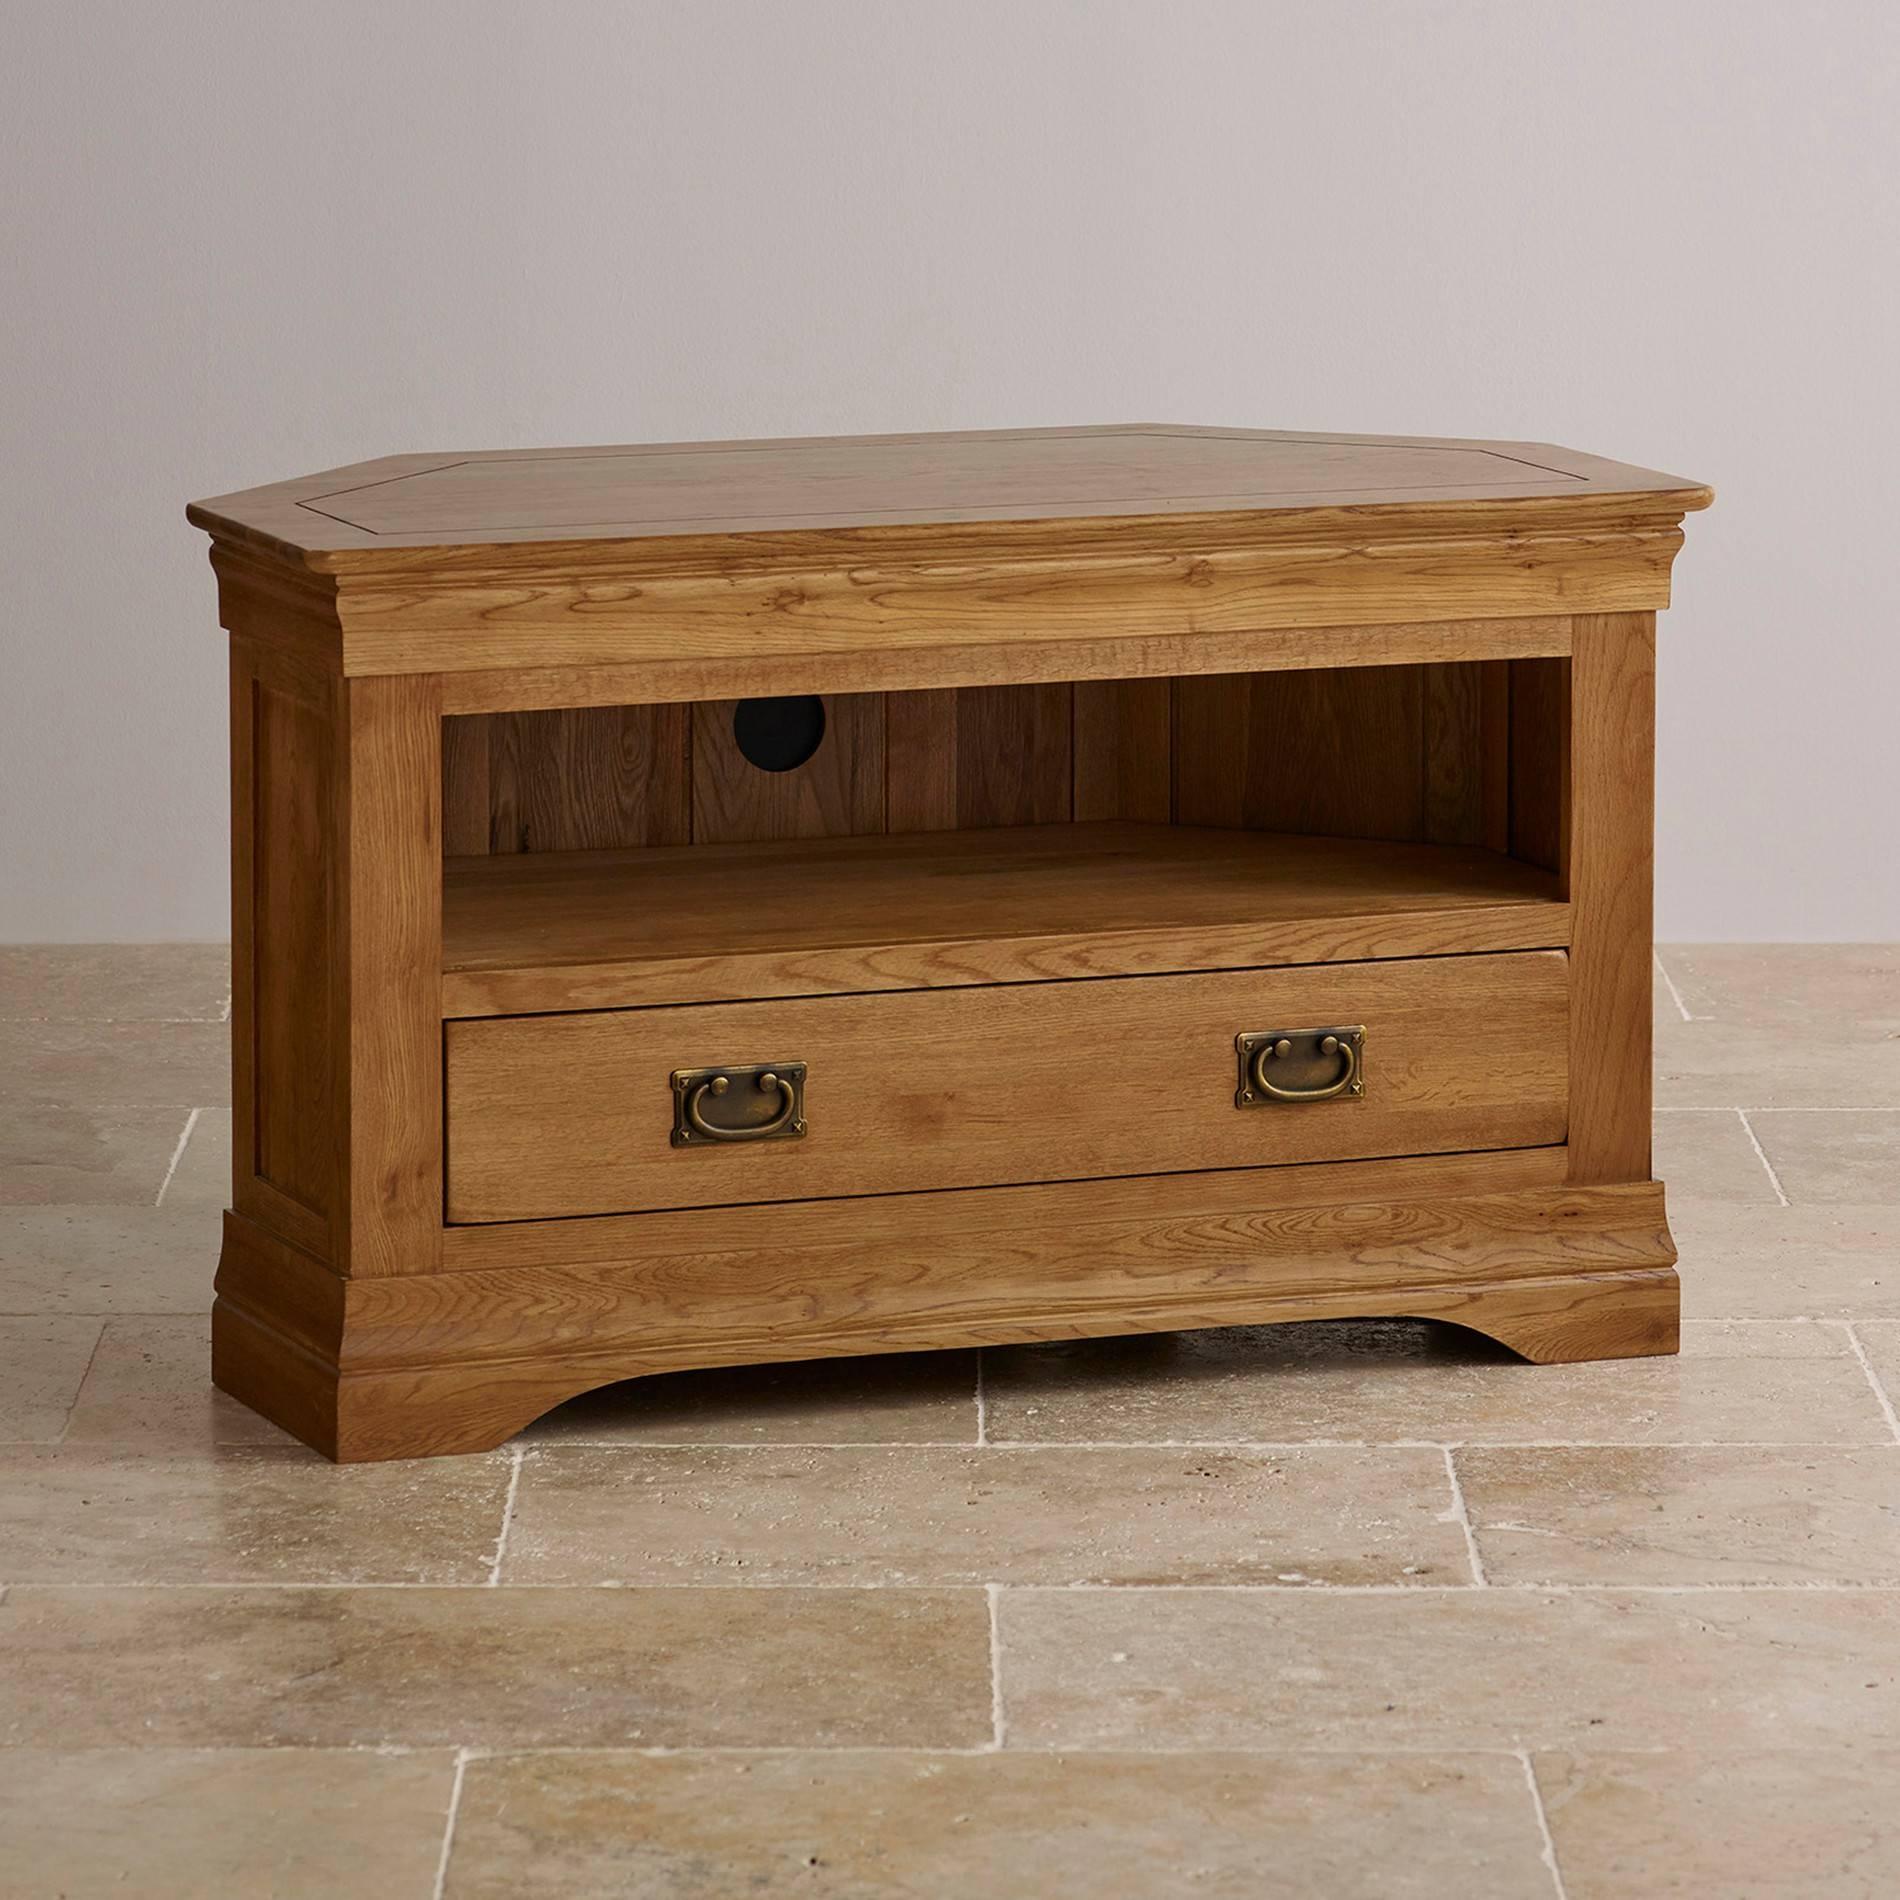 French Farmhouse Corner Tv Unit | Solid Oak | Oak Furniture Land Regarding Oak Corner Tv Cabinets (View 5 of 15)